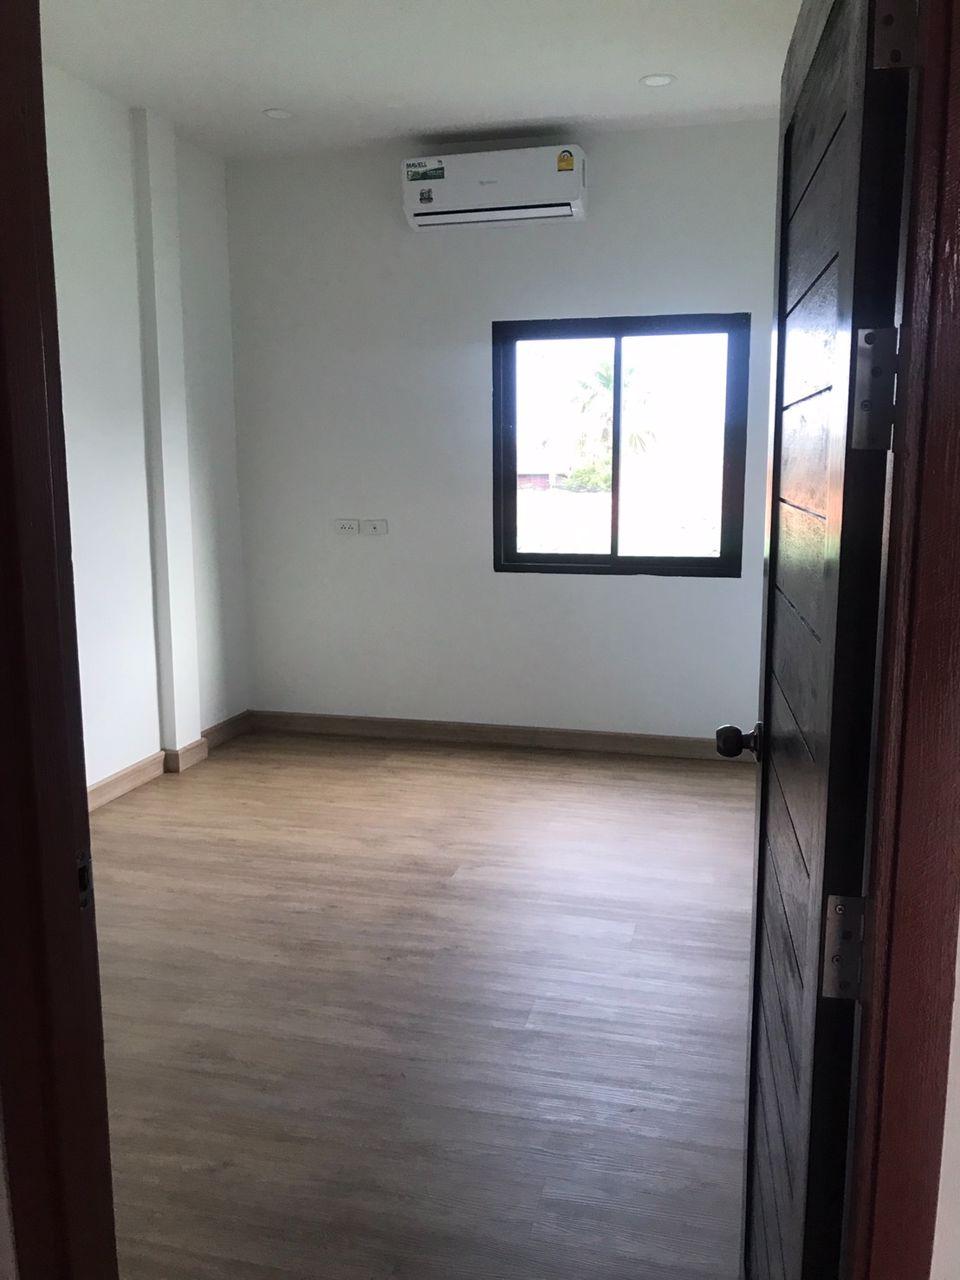 2-storey-townhome-2-bedroom-2-bathroom-best-location-central-of-hua-hin-200-meters